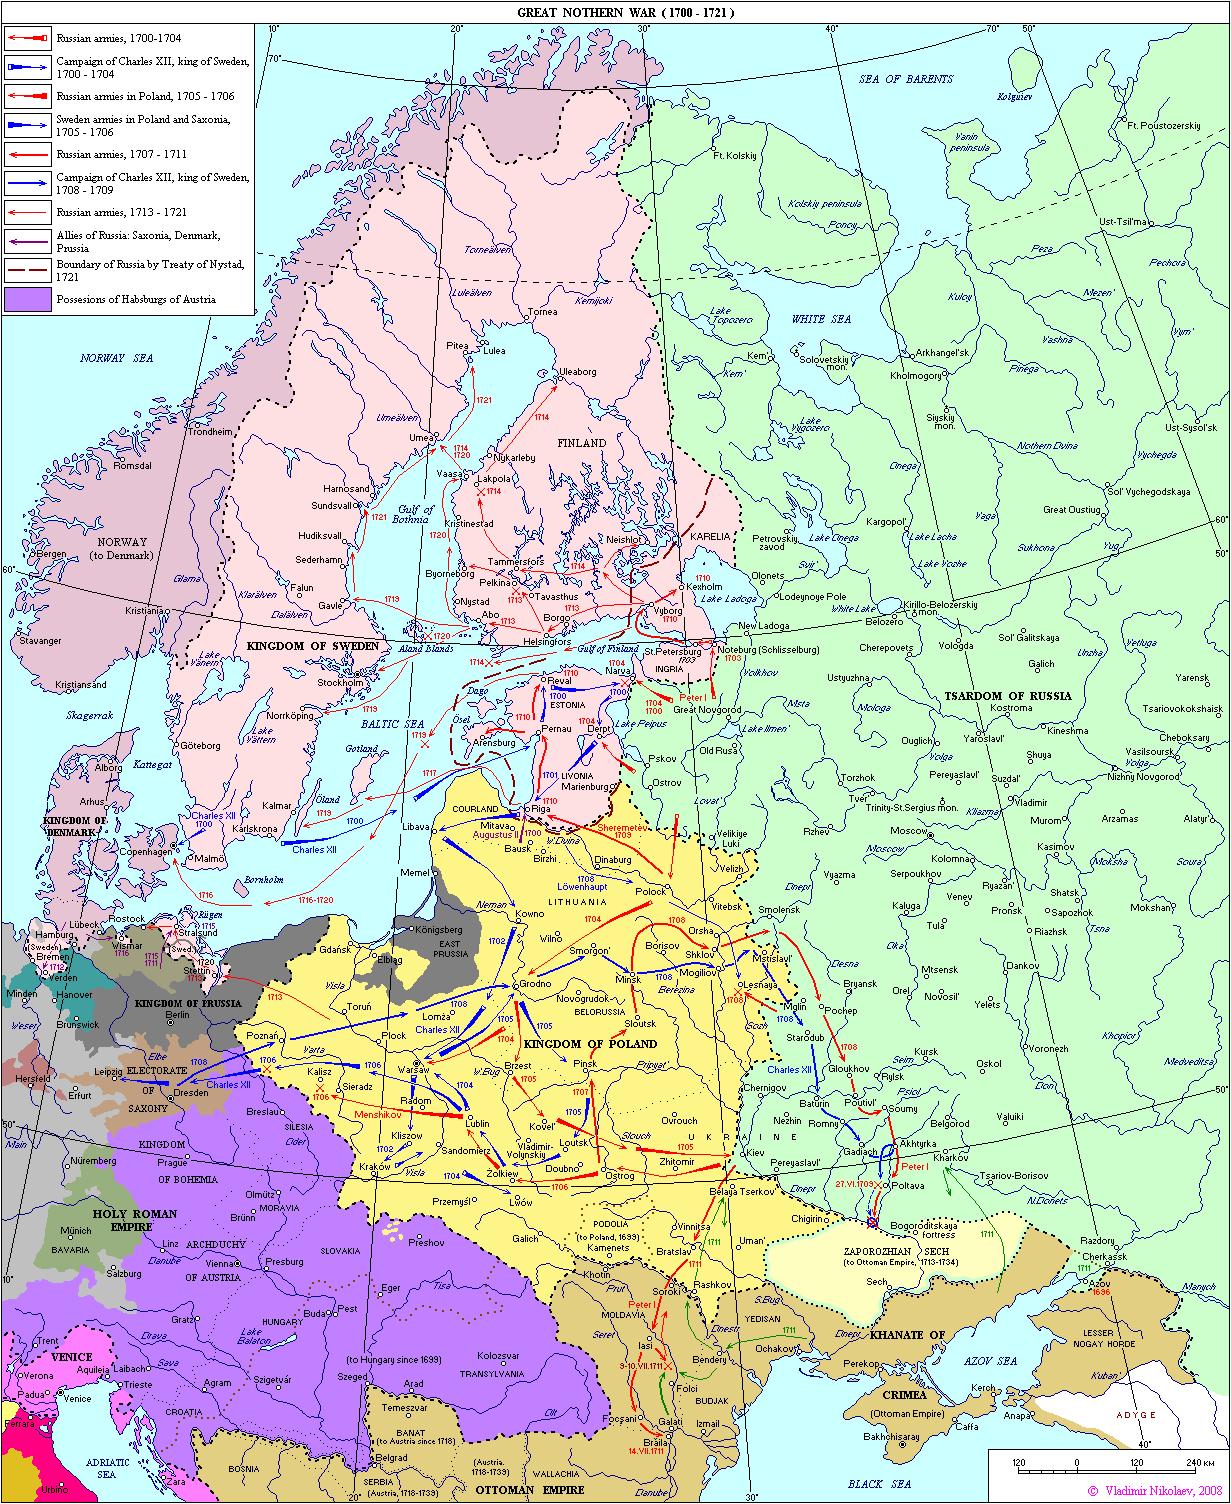 Historical Maps of Russia on moscow map, sarajevo map, jiangmen city map, carpathian mountains map, malopolska map, bregenz austria map, poznan map, naples map, venice map, poland map, kovno map, mielec map, wawel castle map, paris charles de gaulle map, gdansk map, stettin map, singapore hotel map, cracovia polonia map, milan map, transilvania map,